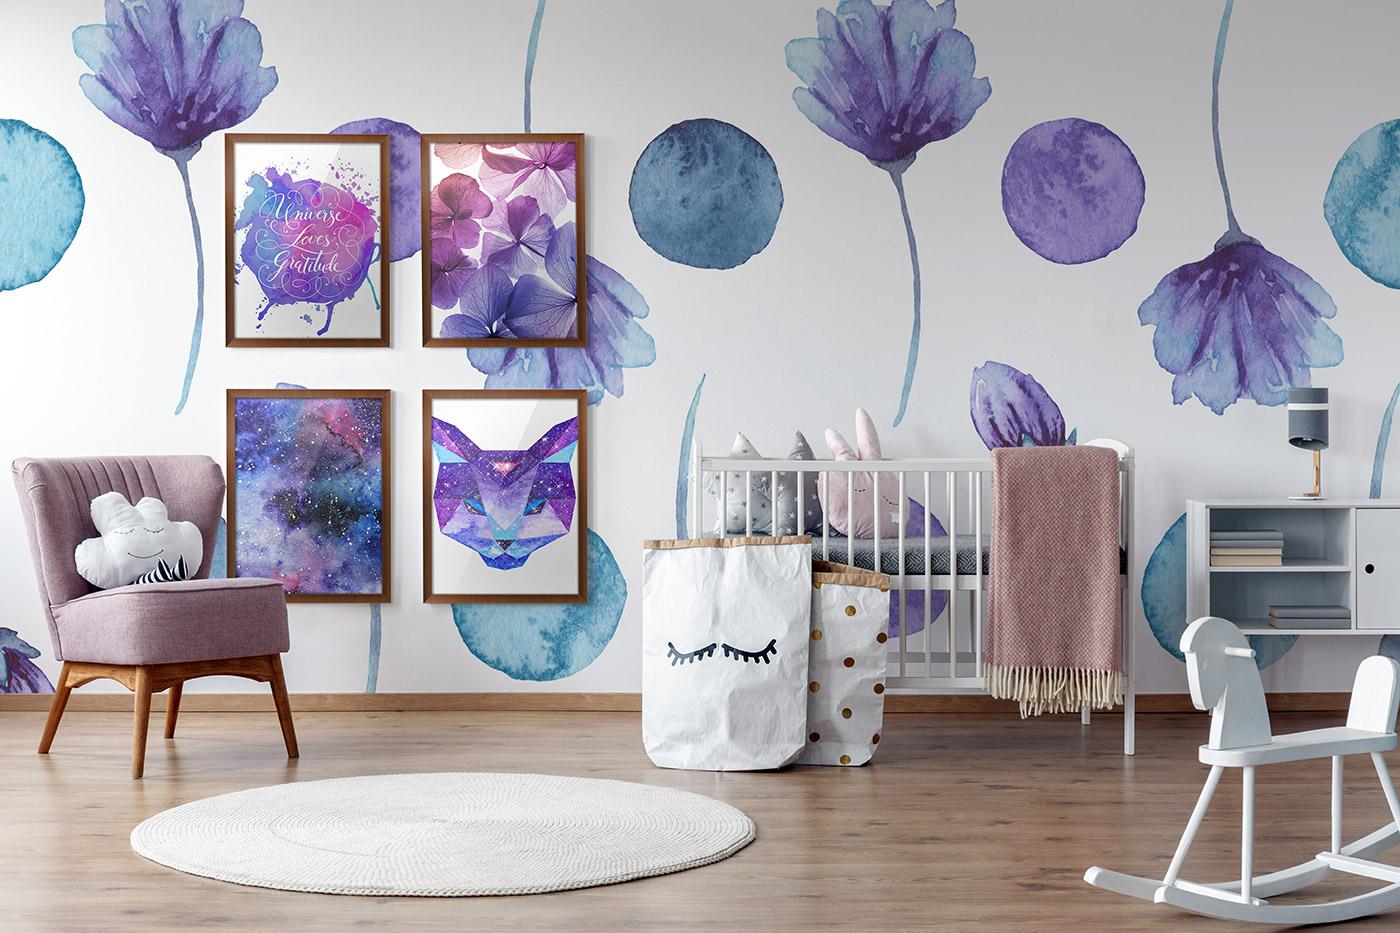 White and purple wallpaper